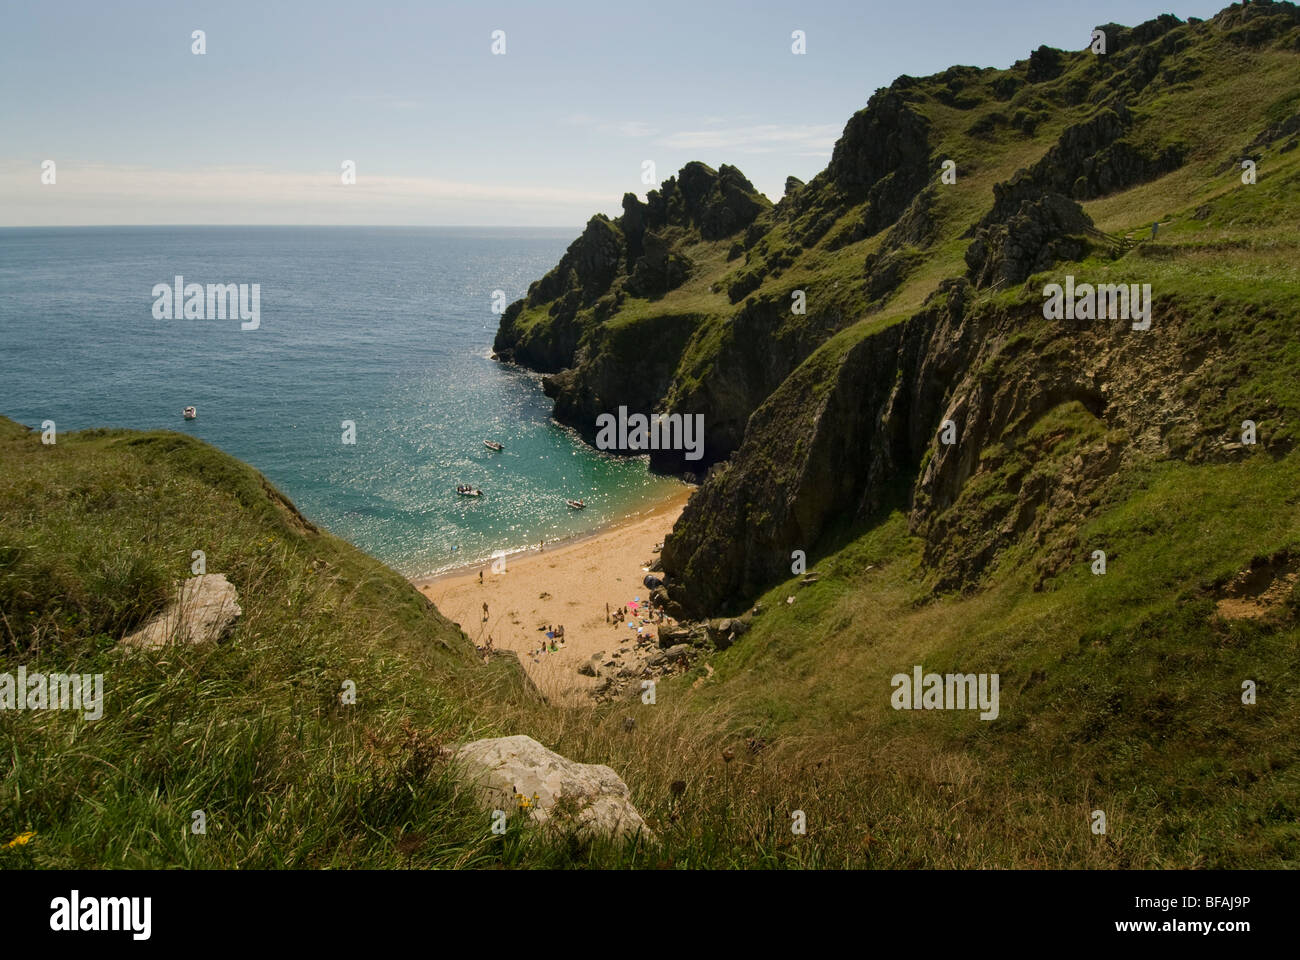 Maceley Cove, South Hams, Devon, England, Vereinigtes Königreich Stockbild